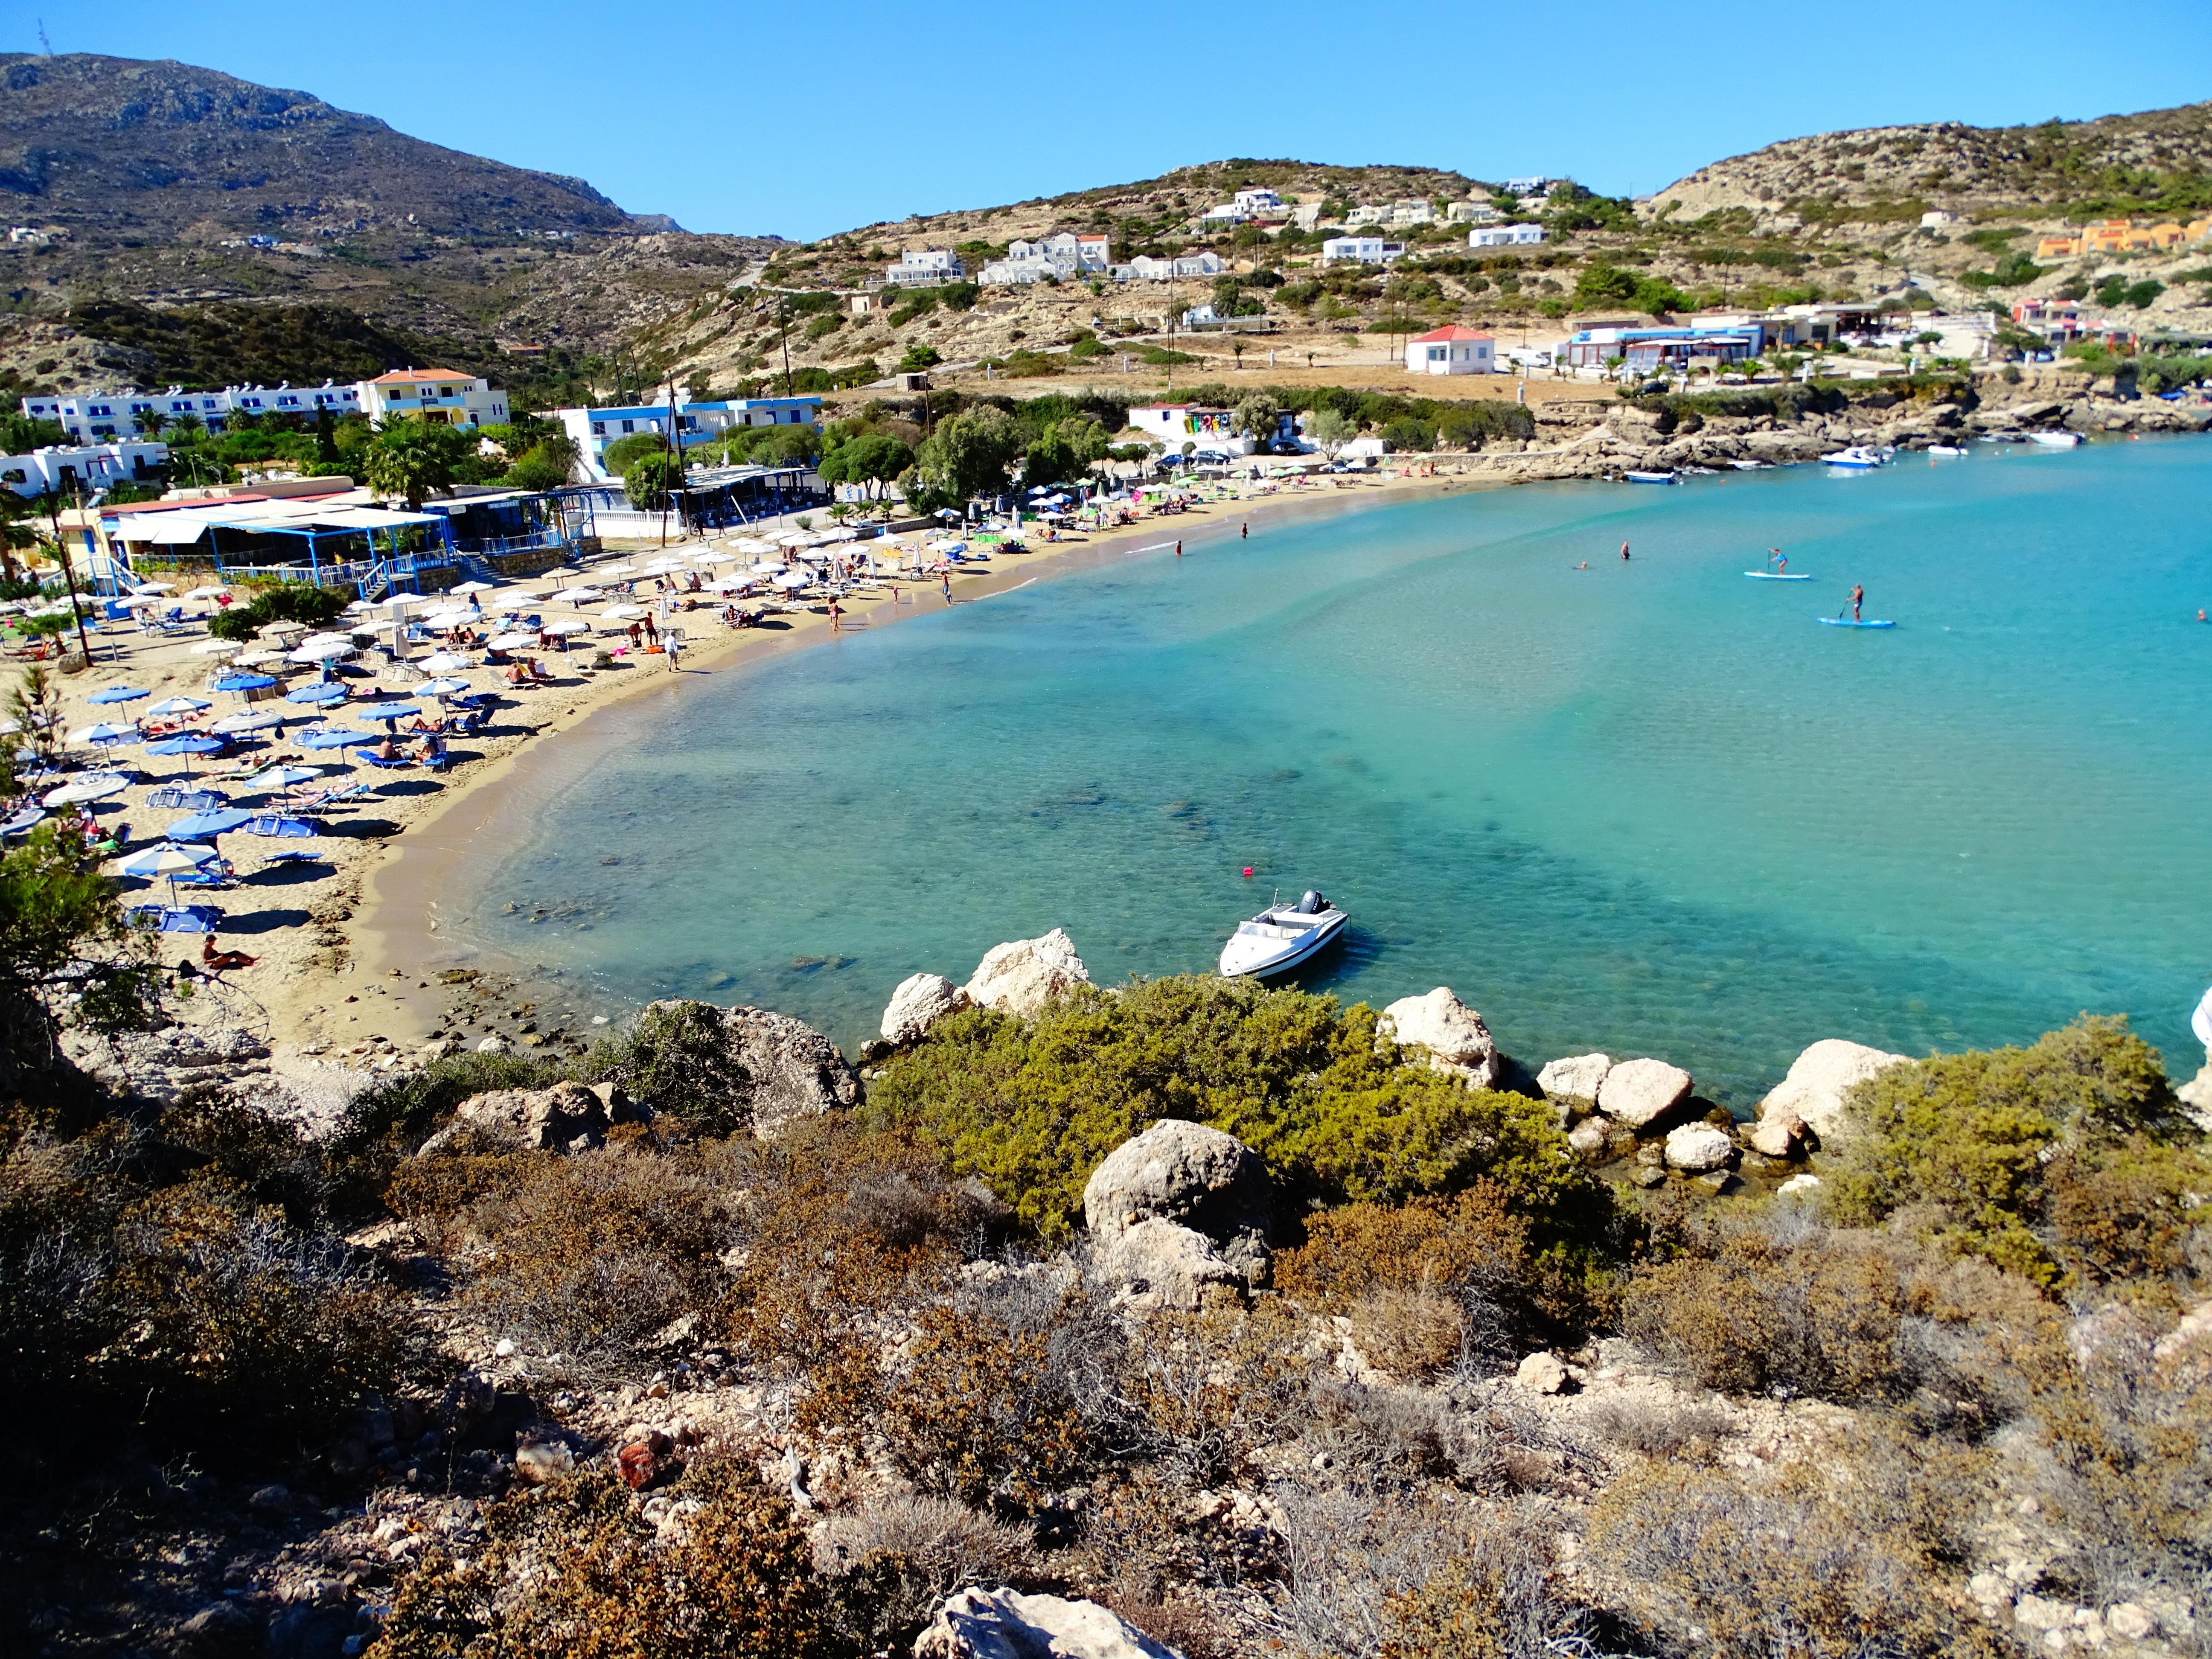 Viagem pelas ilhas gregas: Karpathos